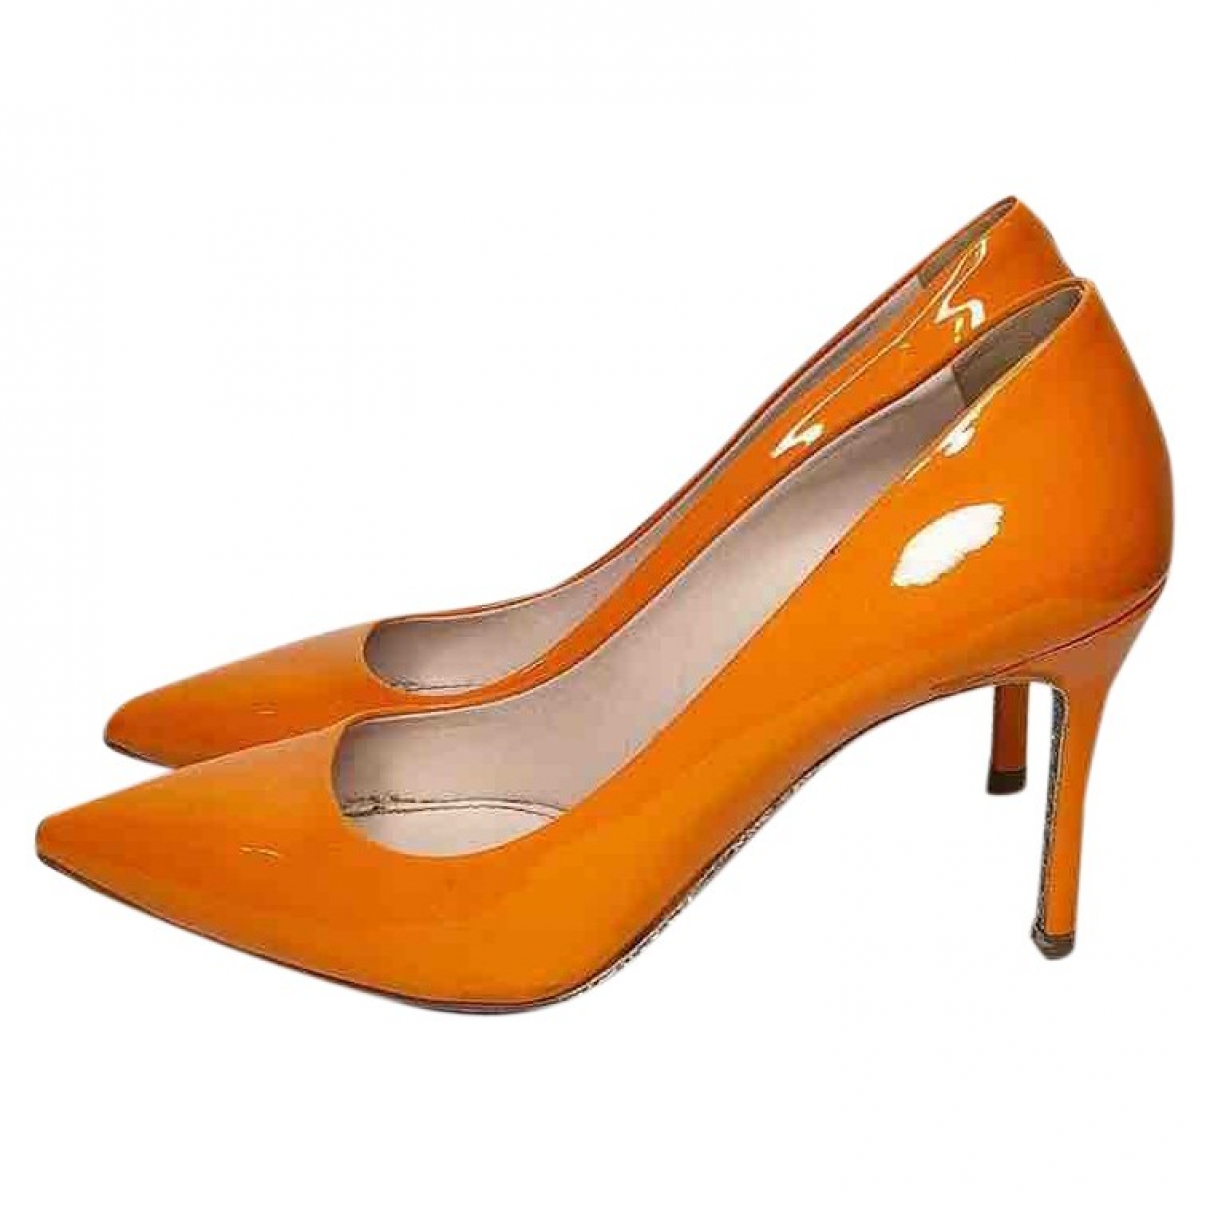 Miu Miu - Escarpins   pour femme en cuir verni - orange